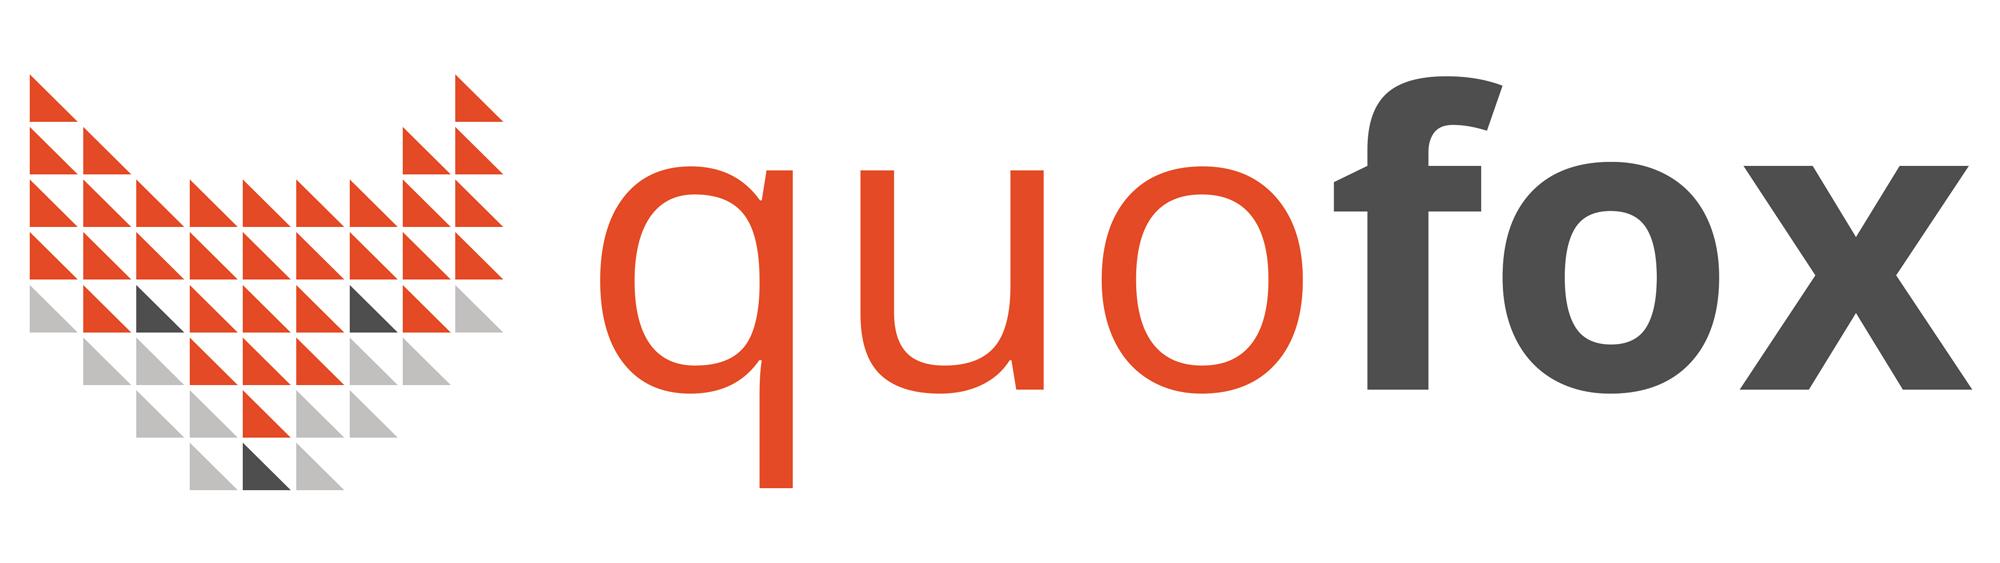 quofox GmbH_logo